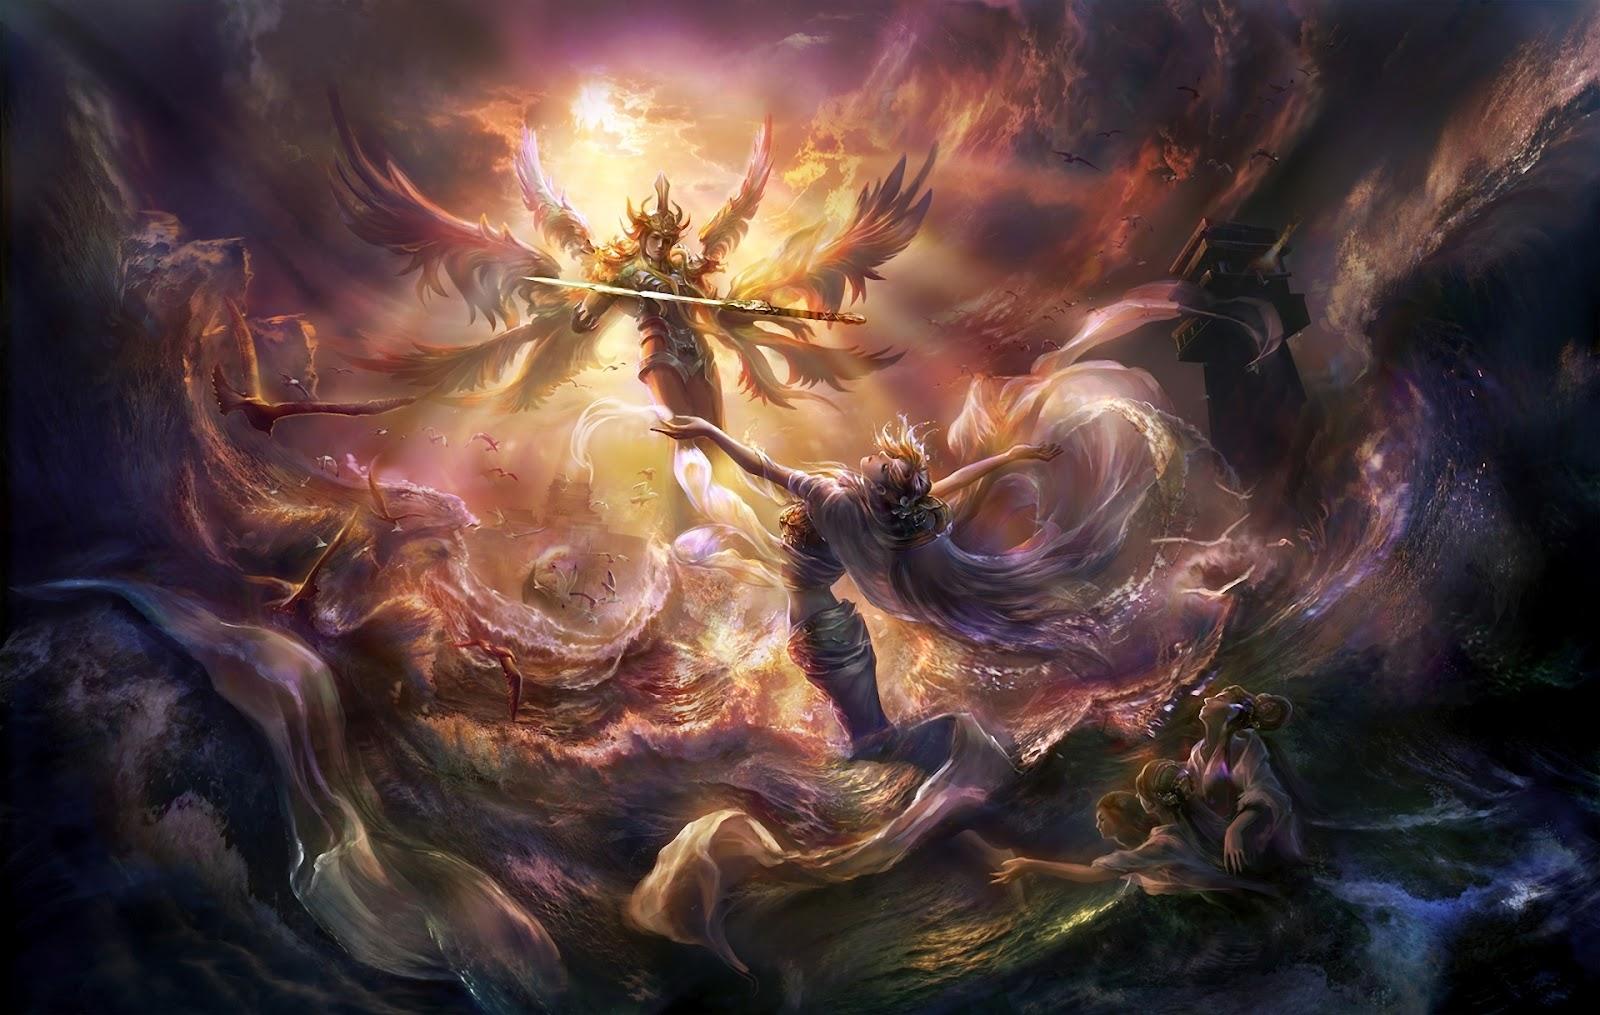 Painting Art Phoenix Fire Fantasy Digital Drawing: Wallpaper: Wallpaper Angels Free